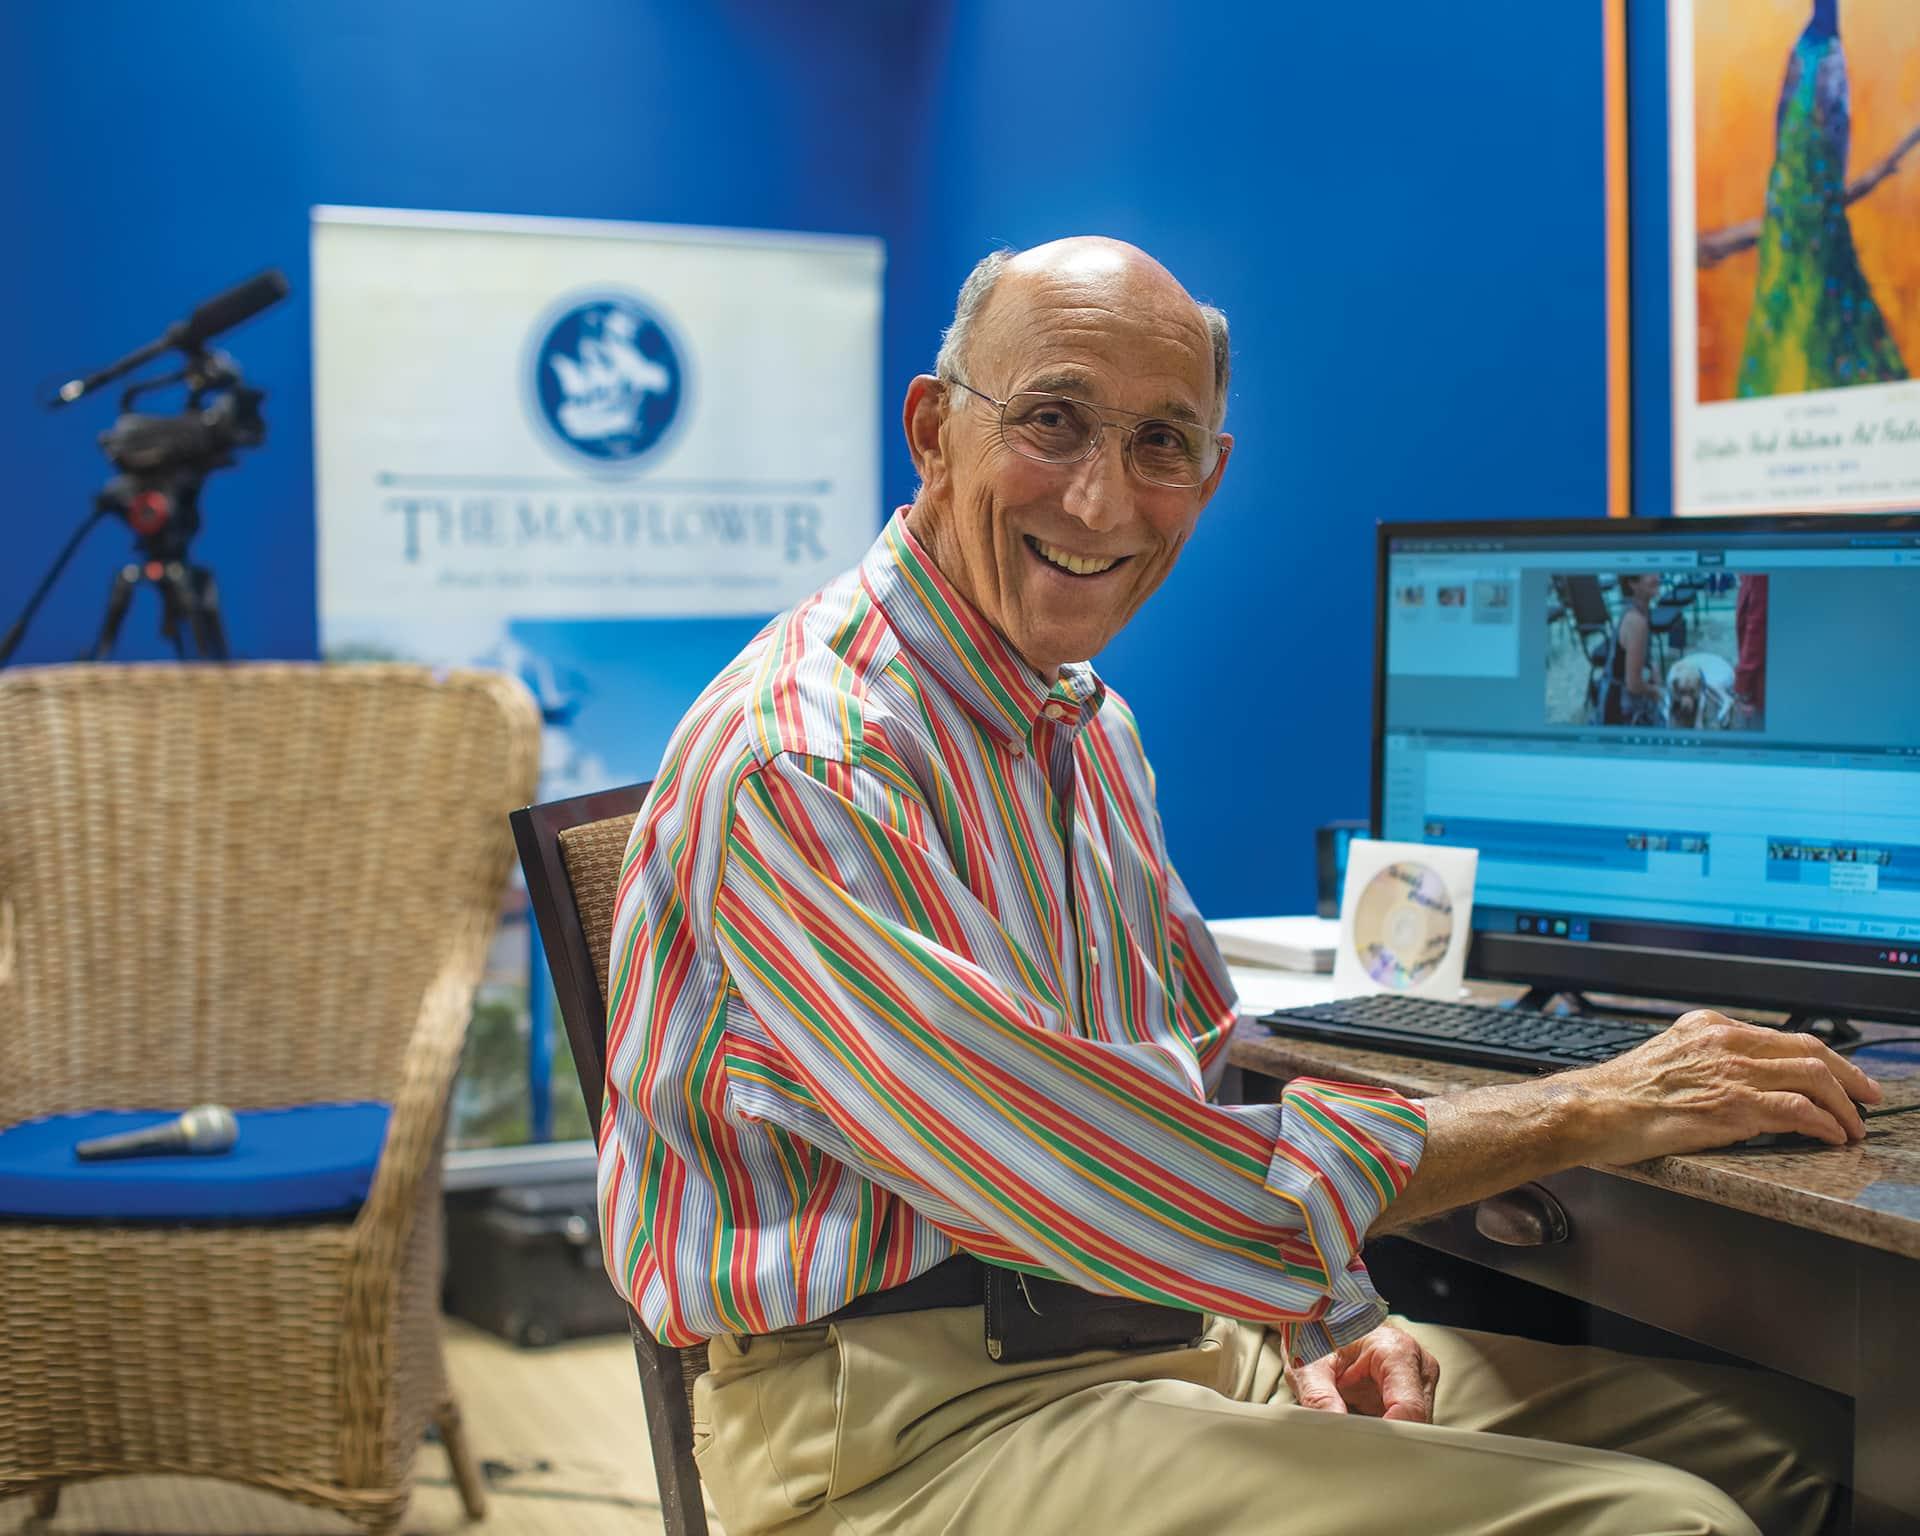 man sitting at a computer smiling